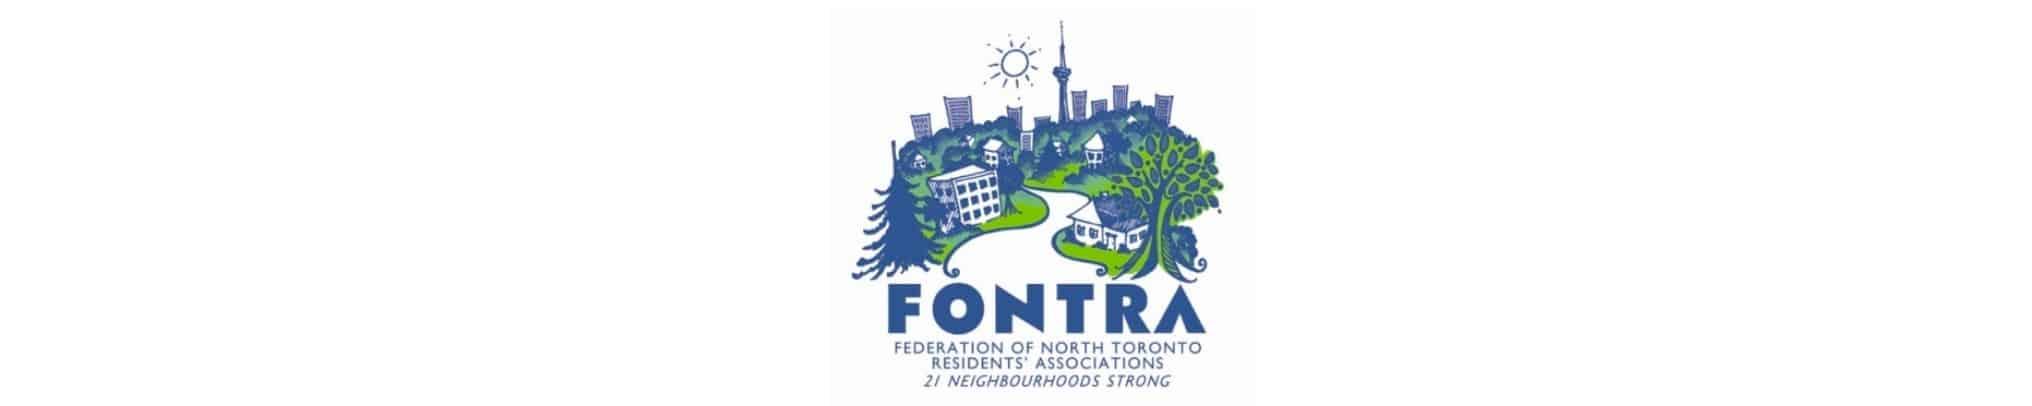 FoNTRA logo